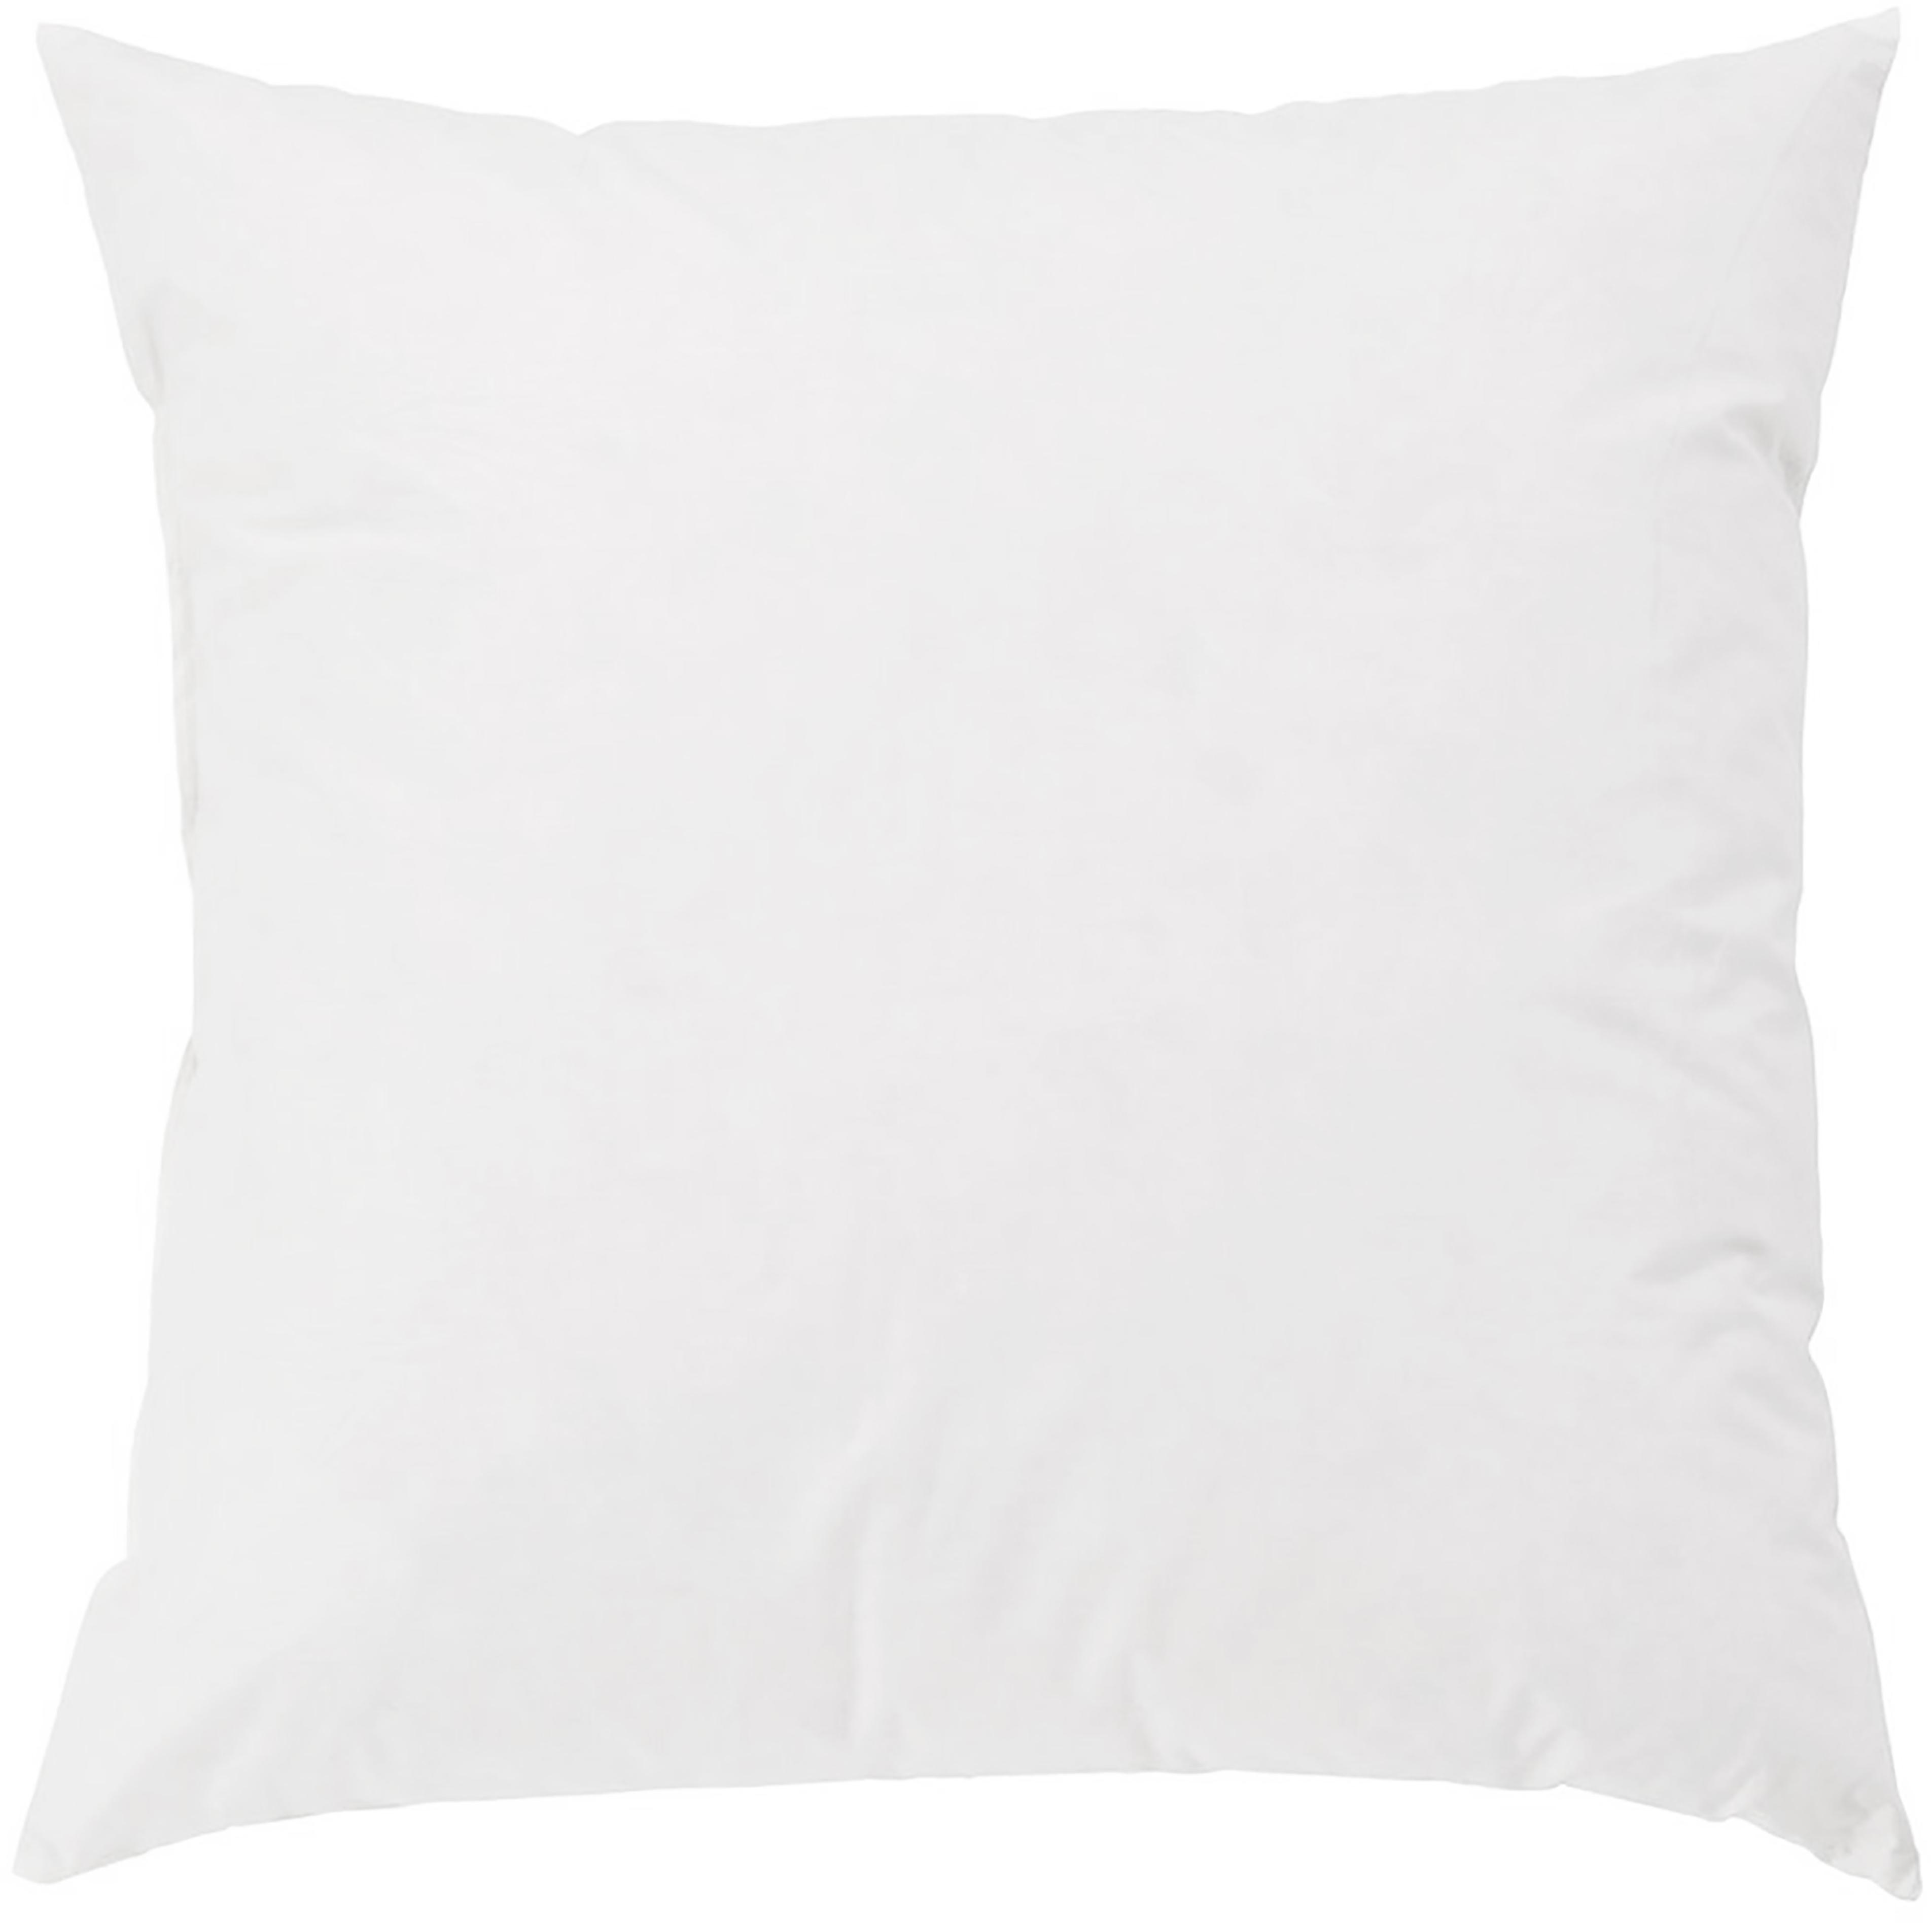 Relleno de cojín Komfort, 50x50, Funda: percal Mako, 100%algodón, Blanco, An 50 x L 50 cm